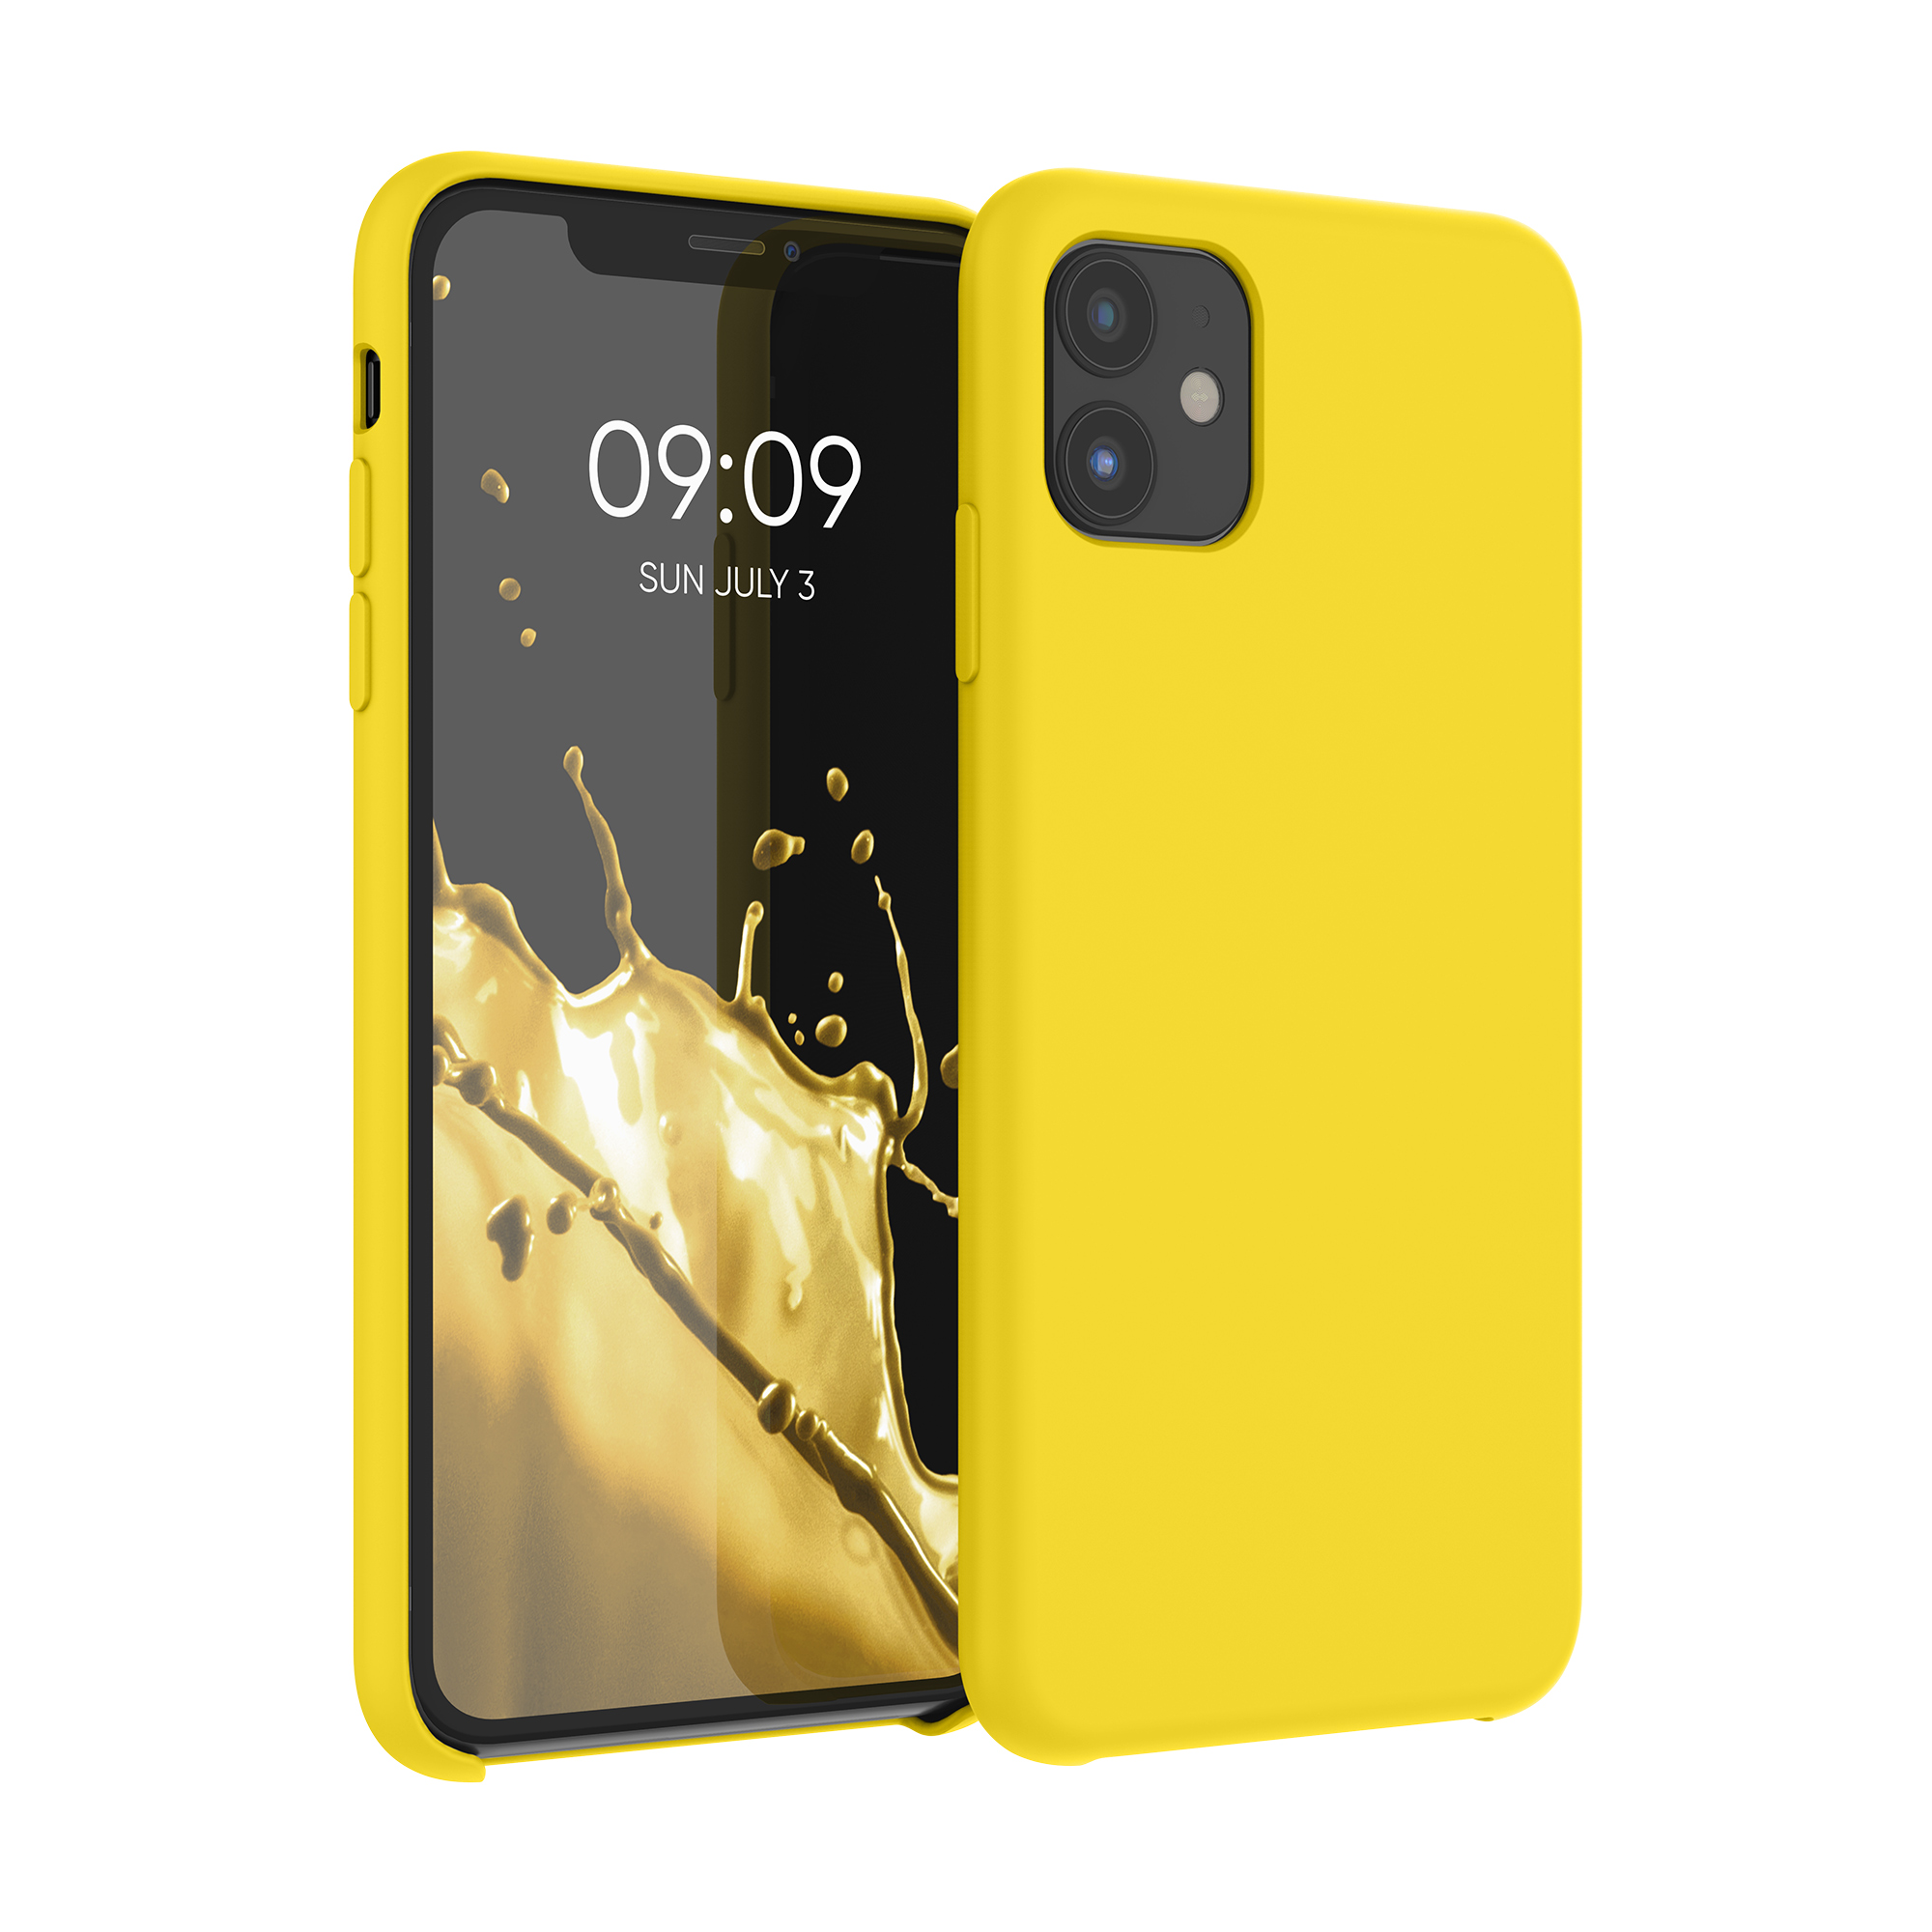 Kvalitní silikonové TPU pouzdro pro Apple iPhone 11 - Vibrant Yellow